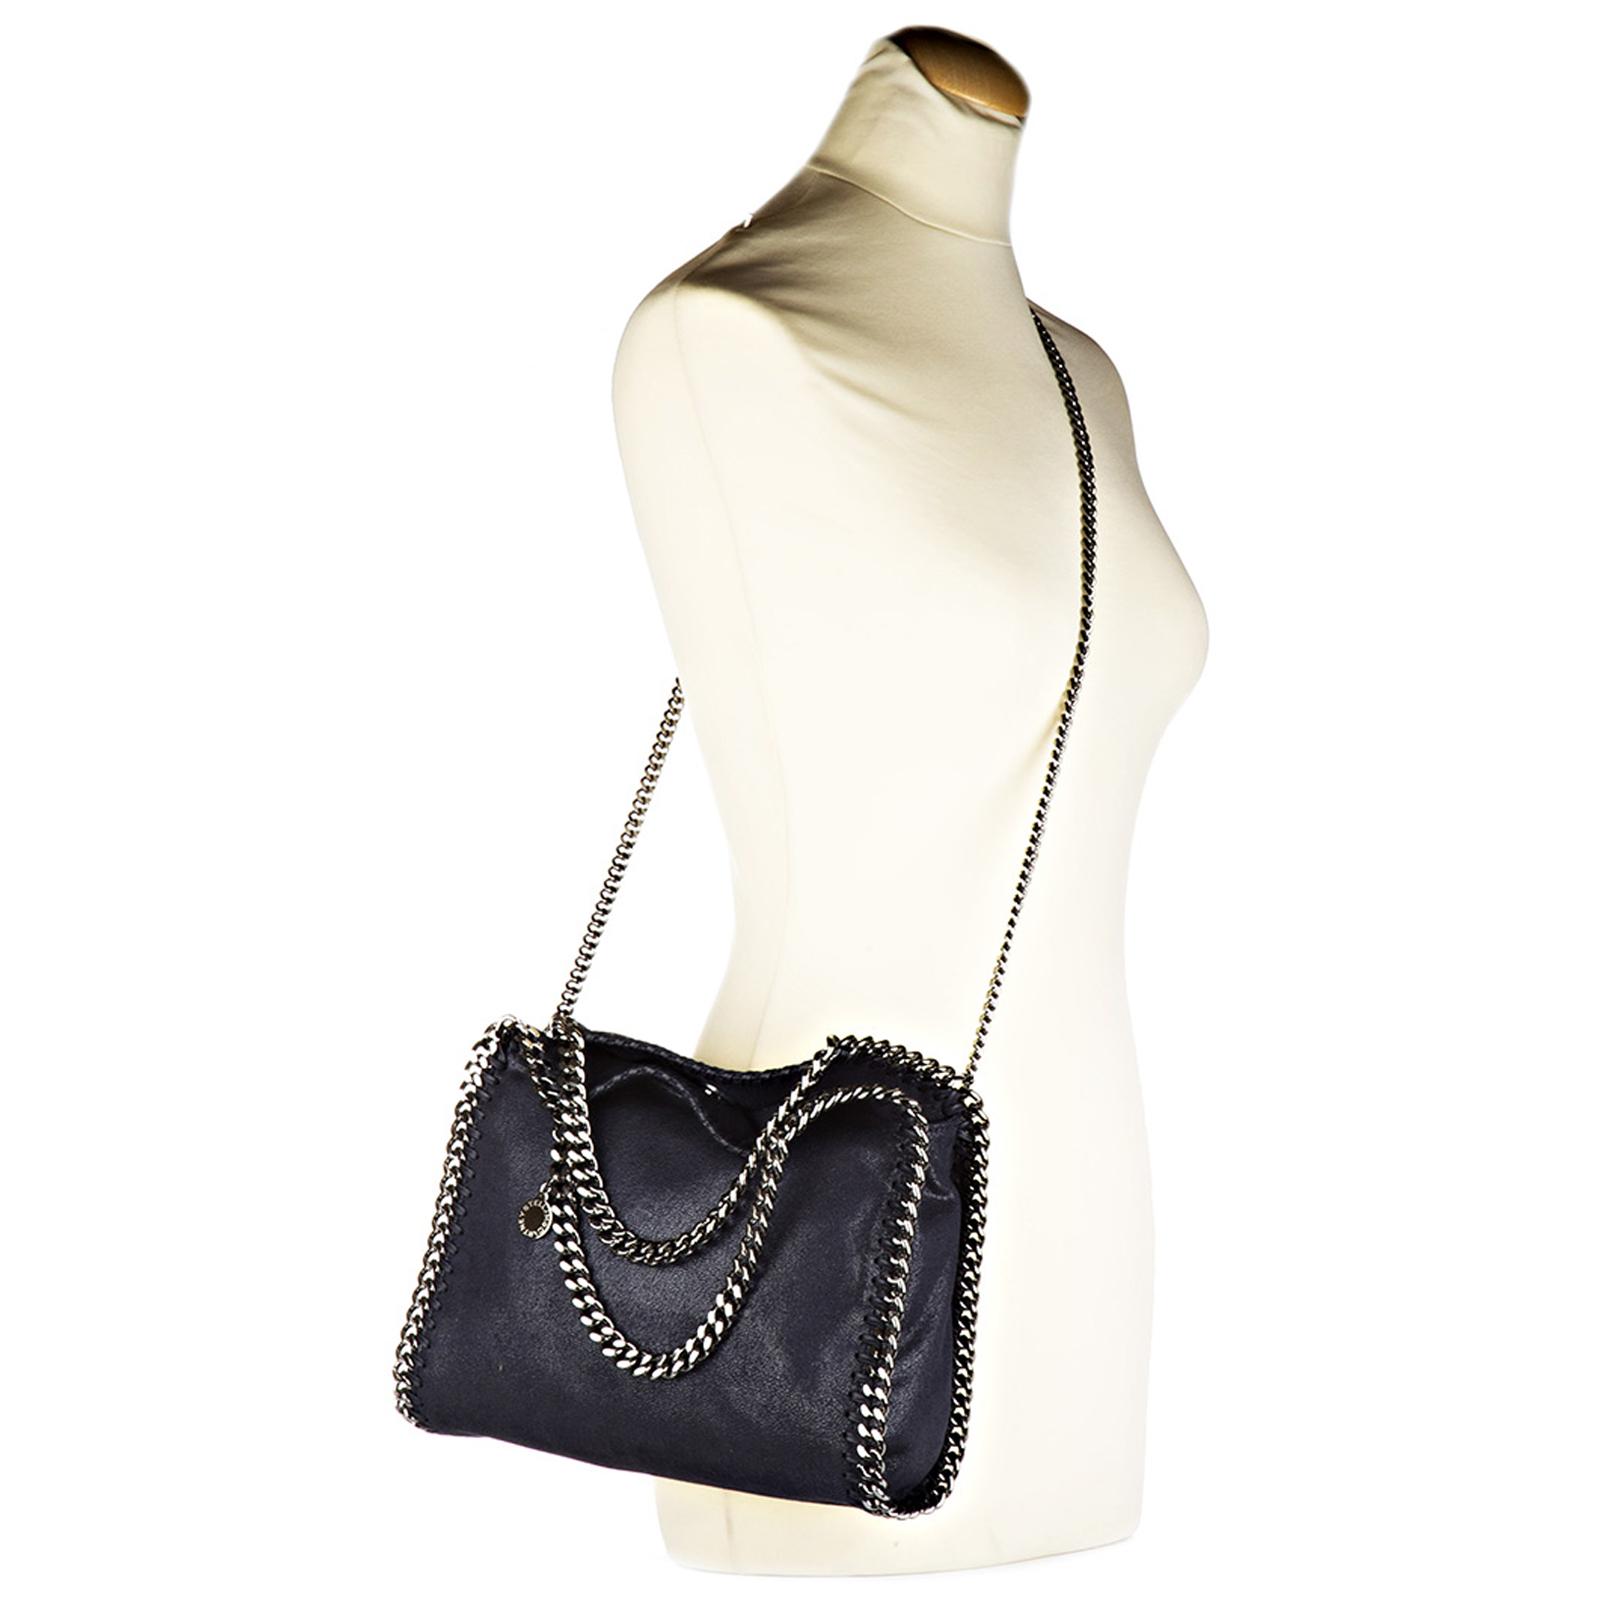 5f1dfdf44ac7 ... Women s handbag shopping bag purse falabella mini shaggy deer ...